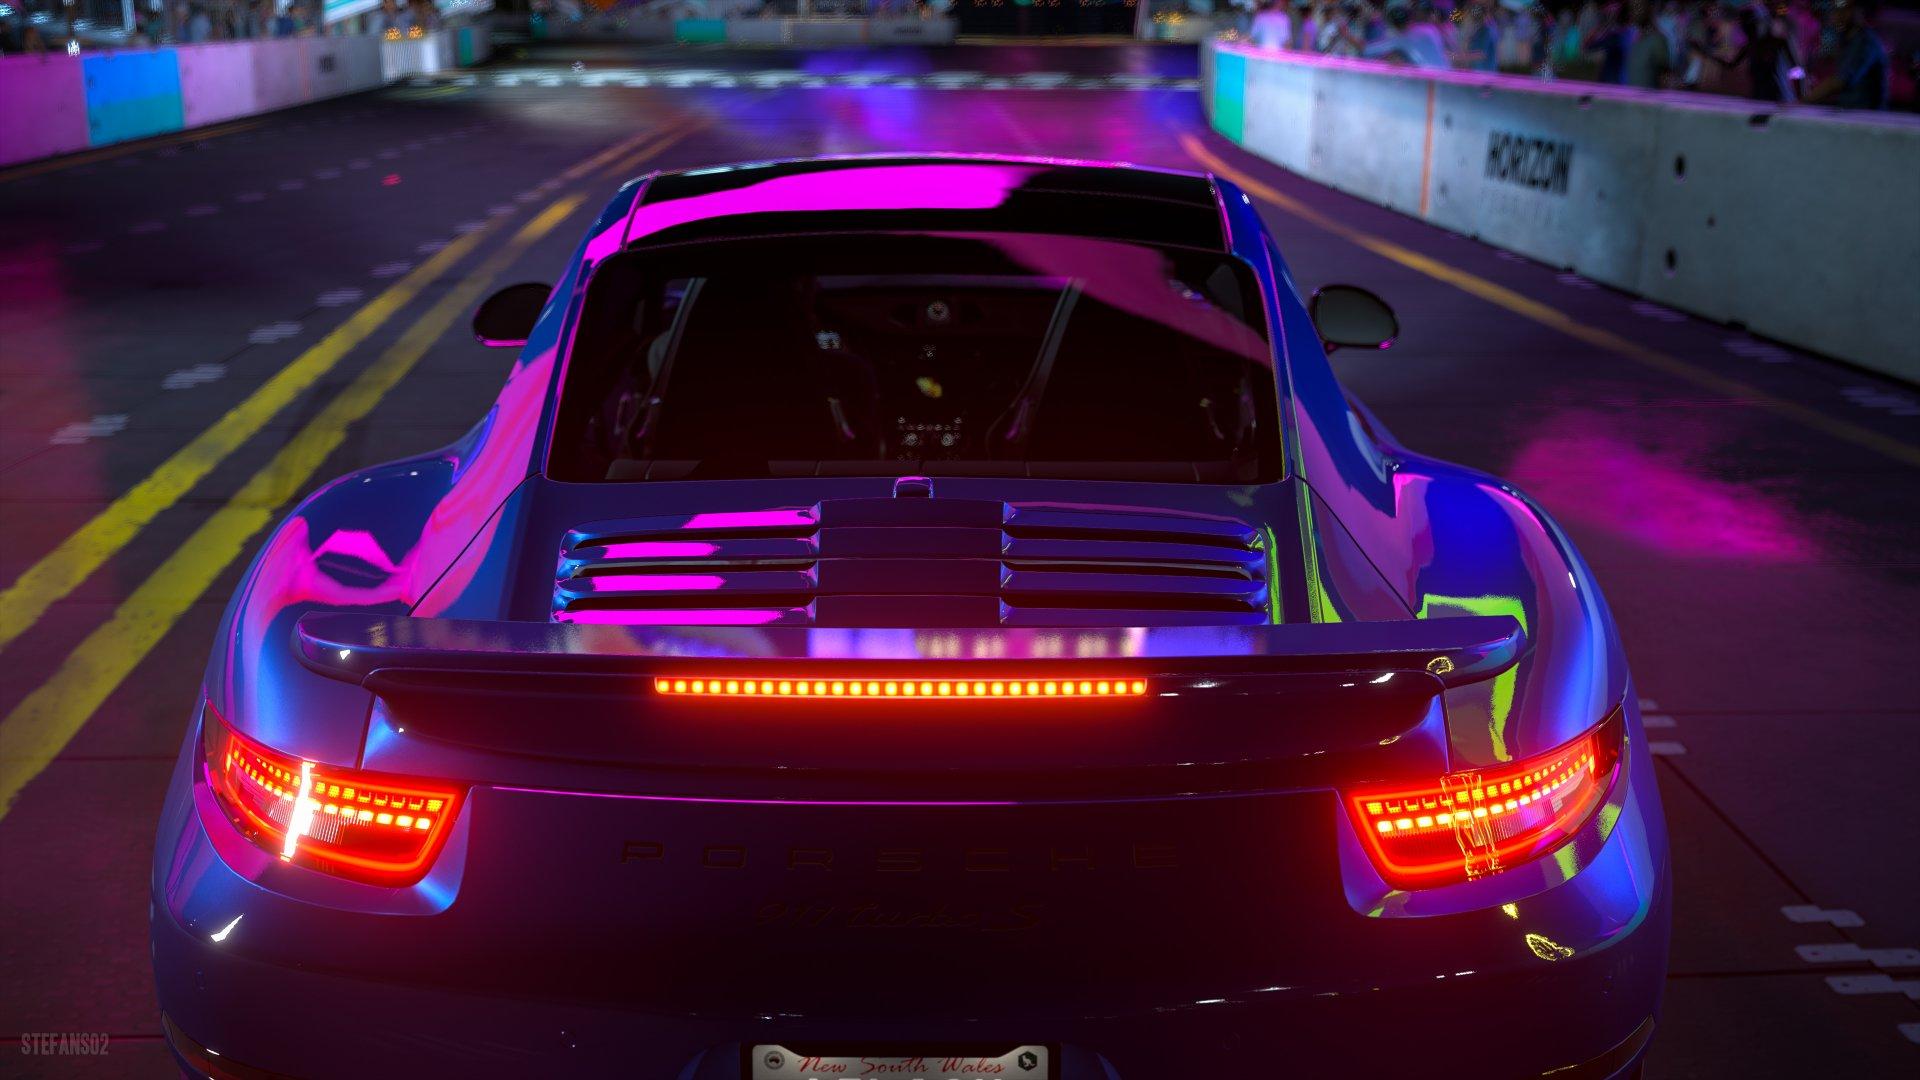 Forza Horizon 3 / Braking 4k Ultra HD Wallpaper